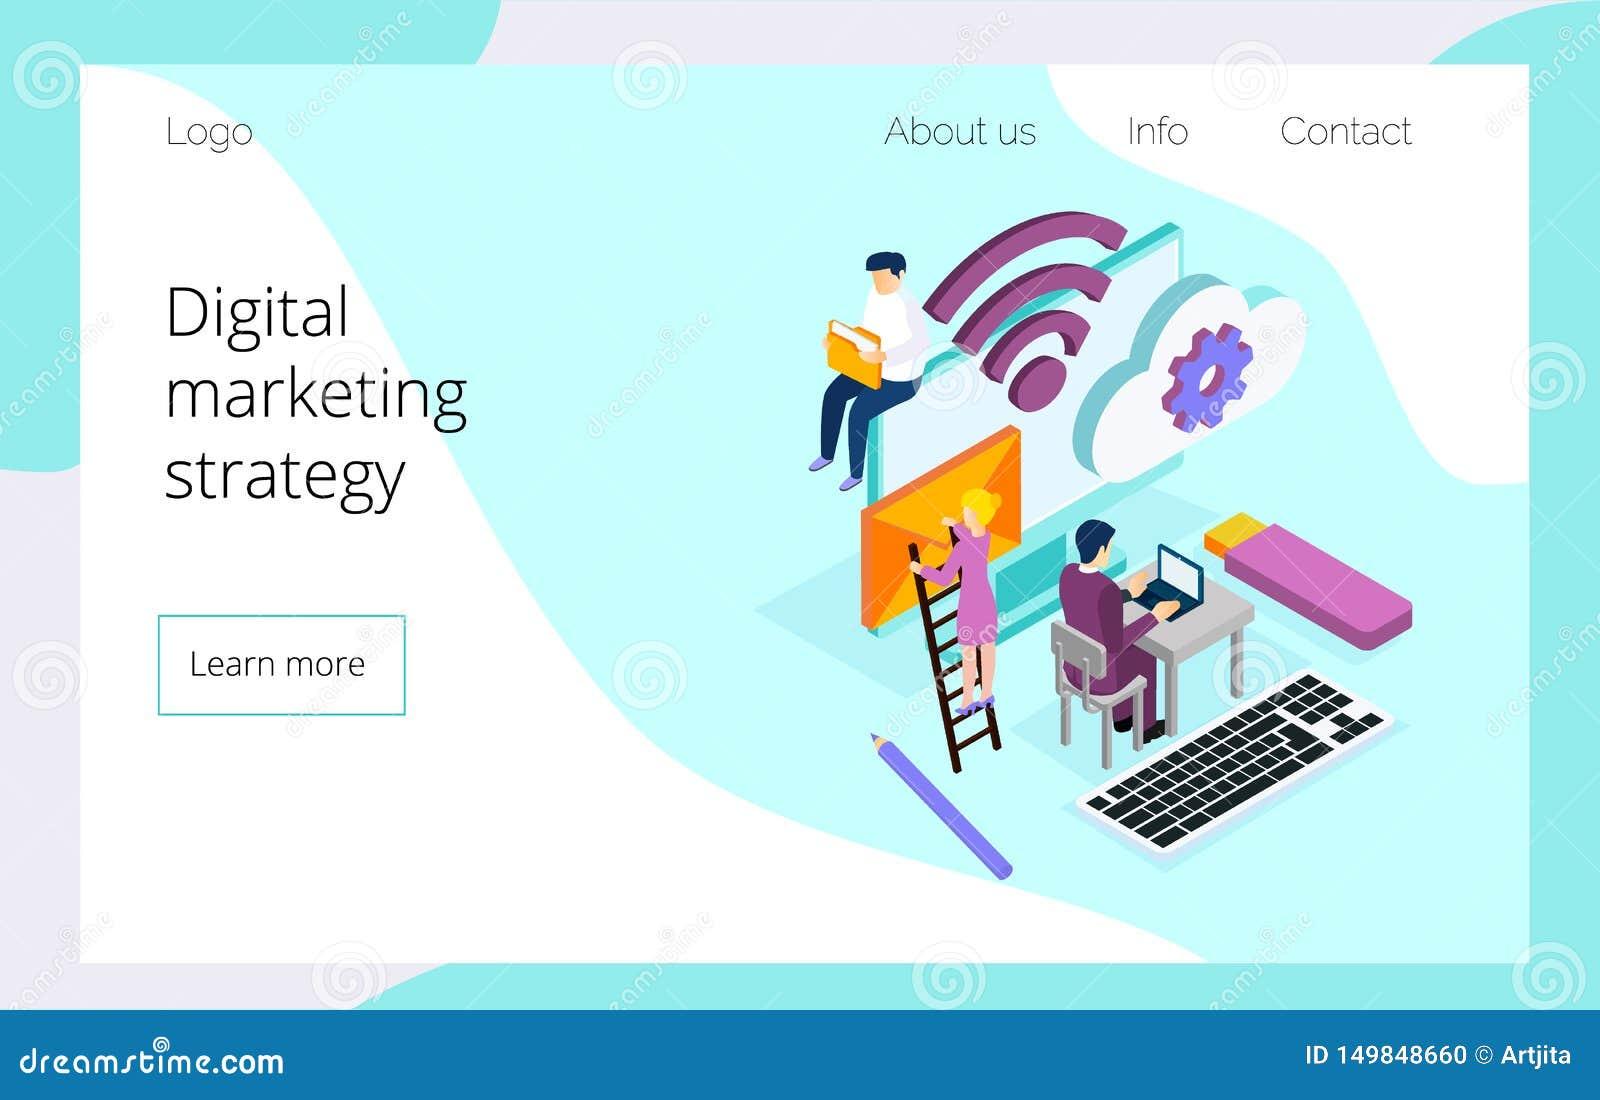 Isometrisch team van specialisten die aan digitale marketing strategie landende pagina werken